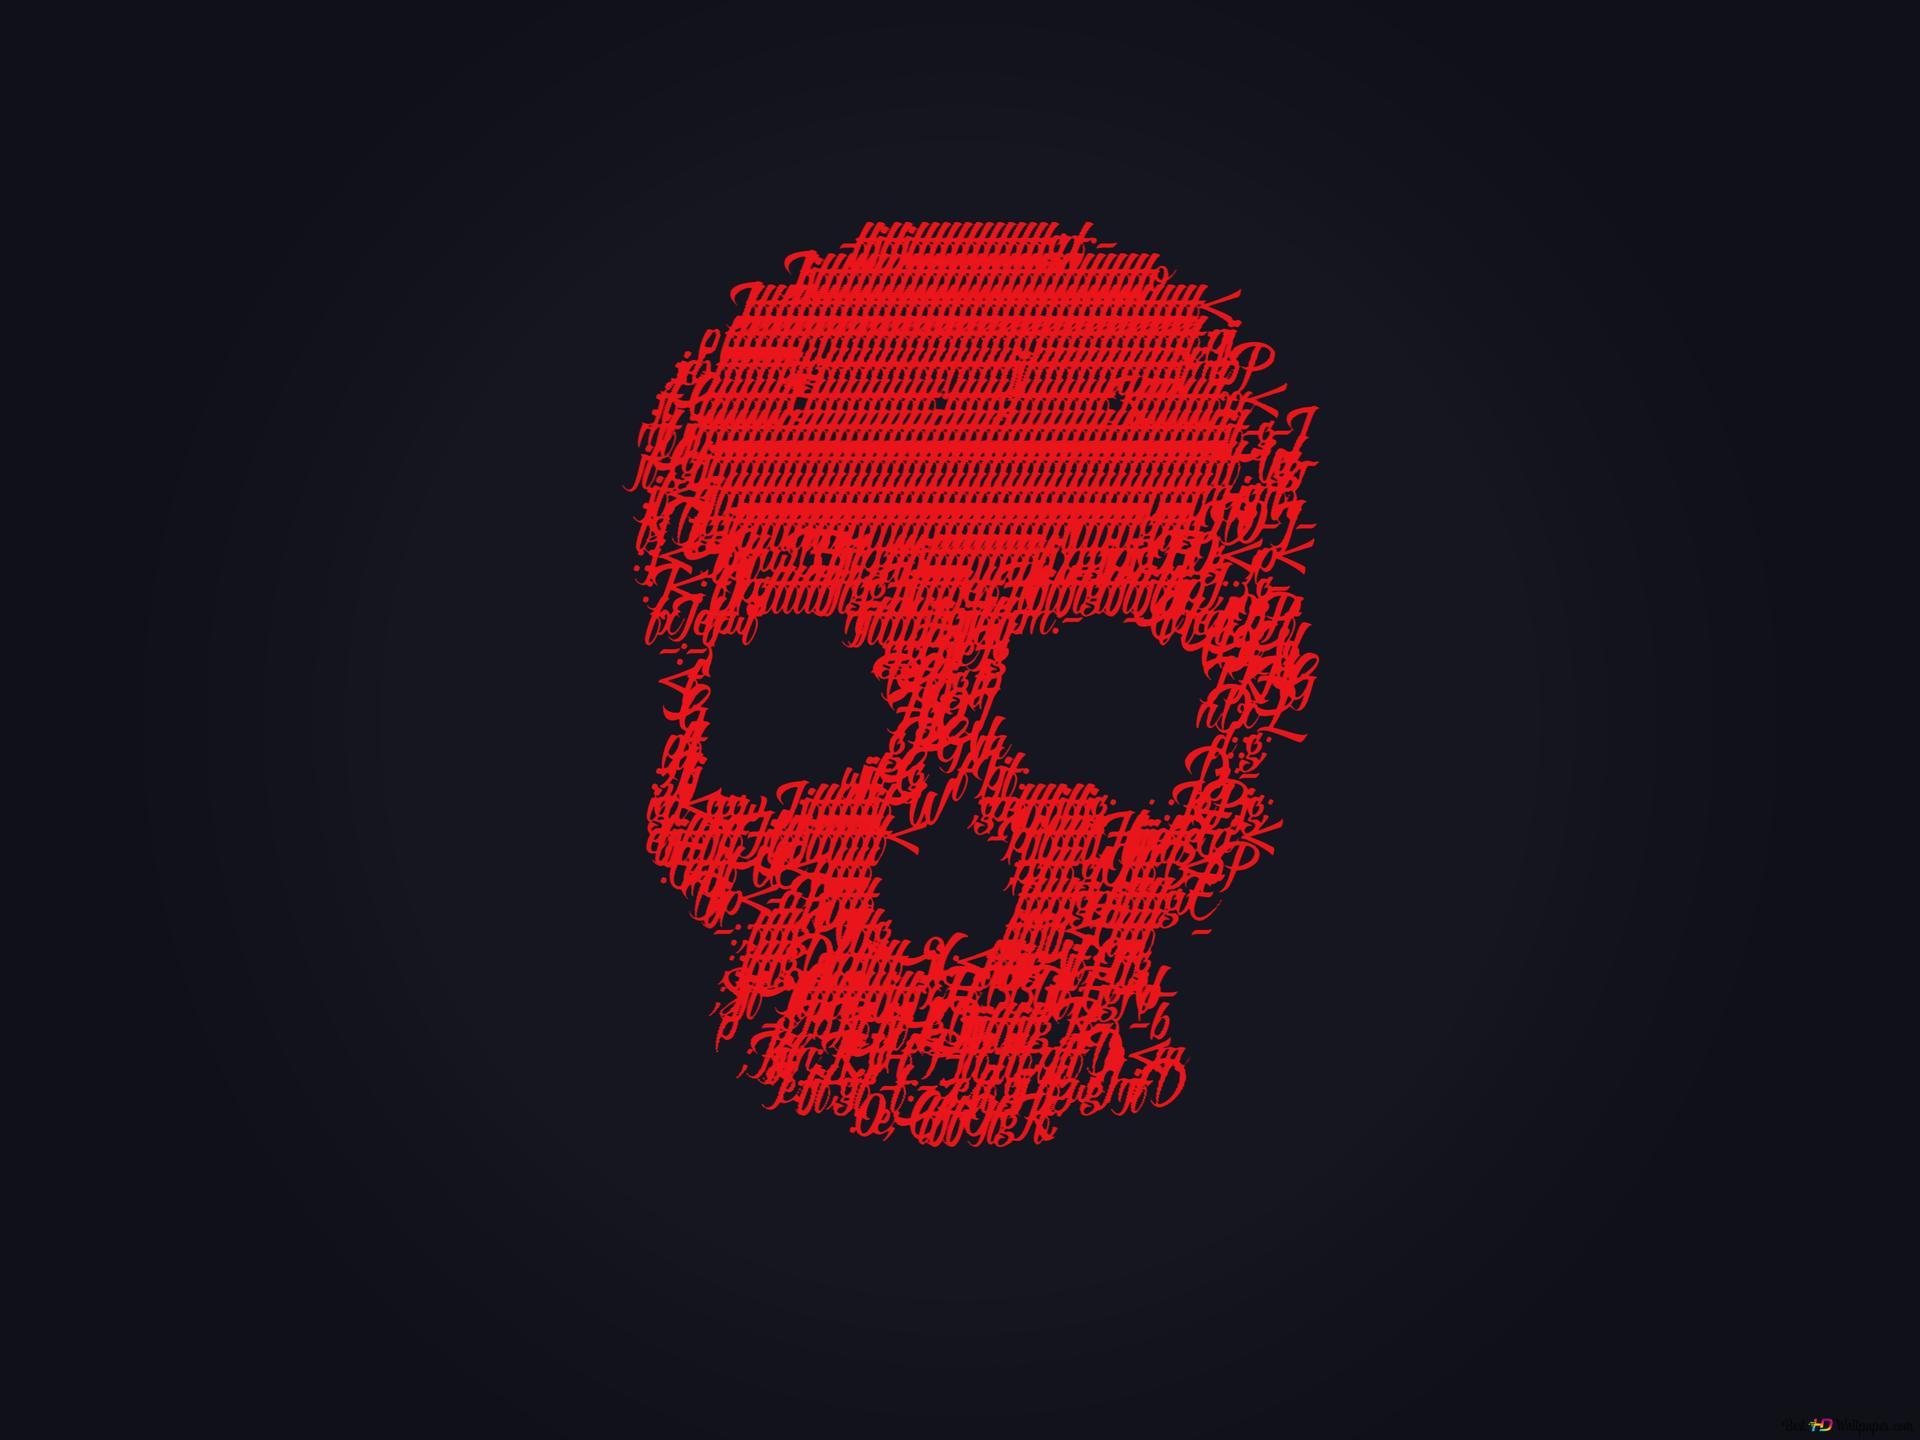 Red skull HD wallpaper download